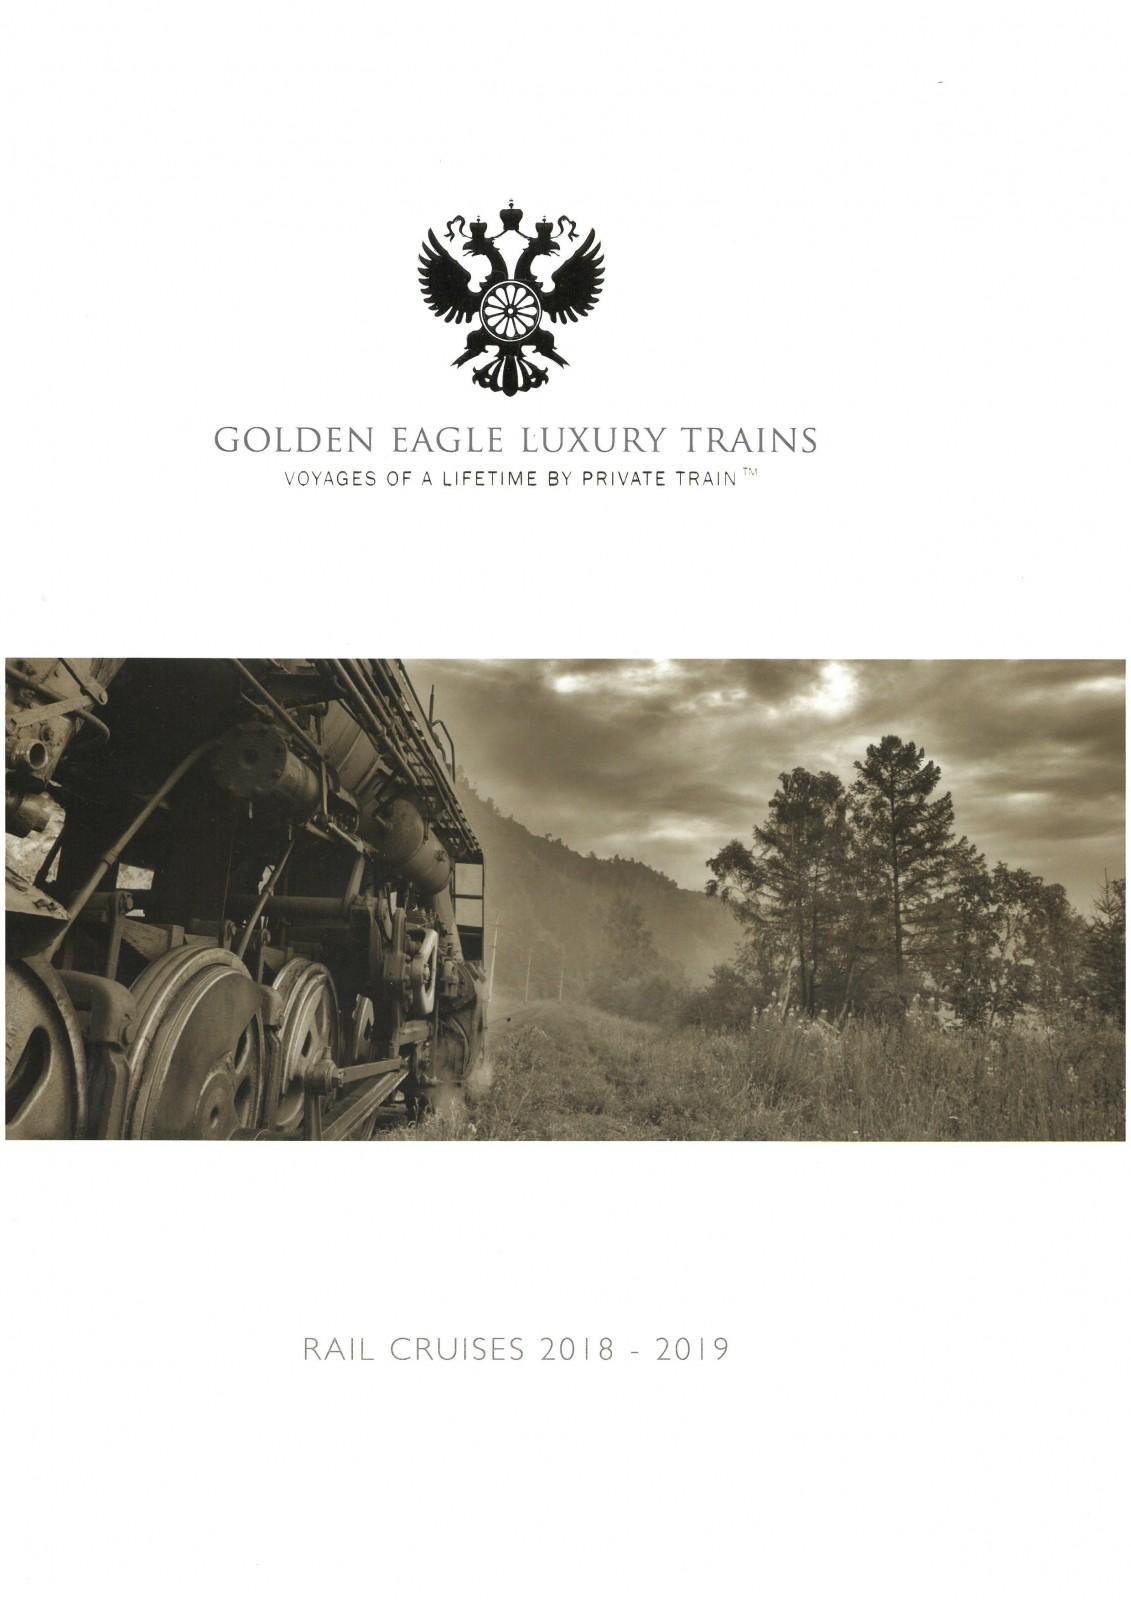 Katalogtitel Golden Eagle Luxury Trains - Rail Cruises 2018 - 2019